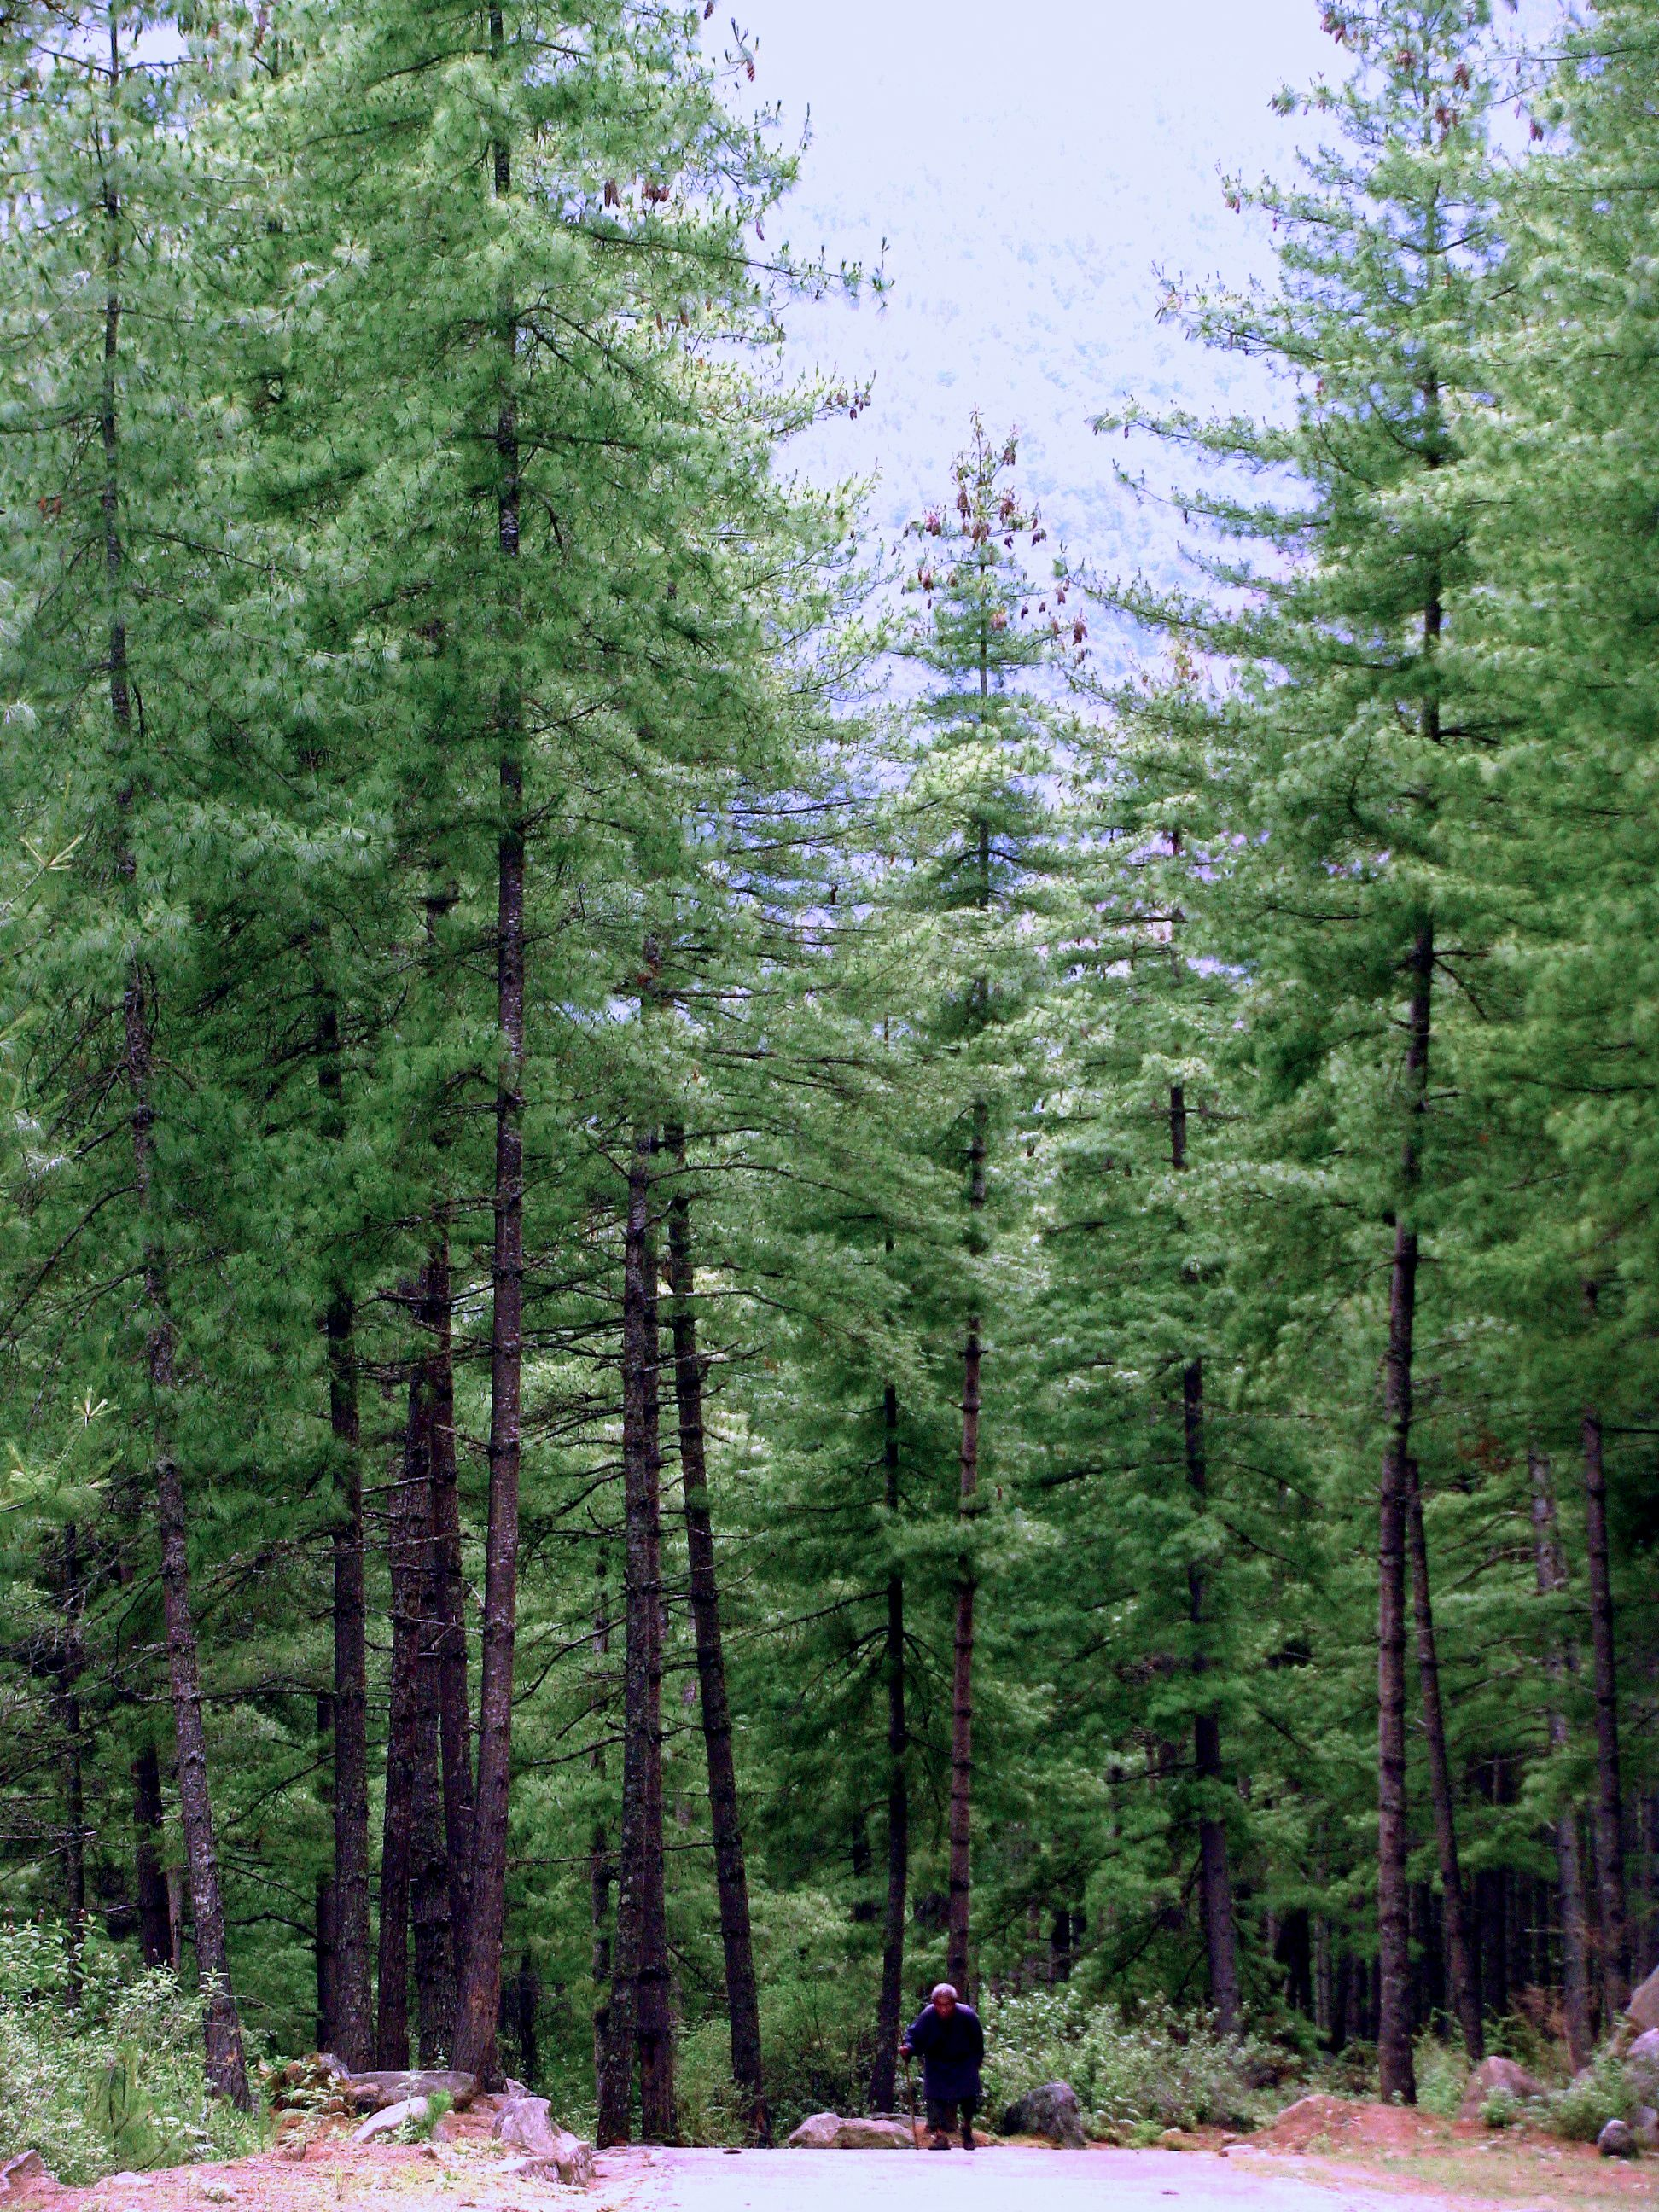 hindu singles in white pine Pinus wallichiana is a coniferous evergreen tree native to the himalaya, karakoram and hindu kush mountains and himalayan white pine.